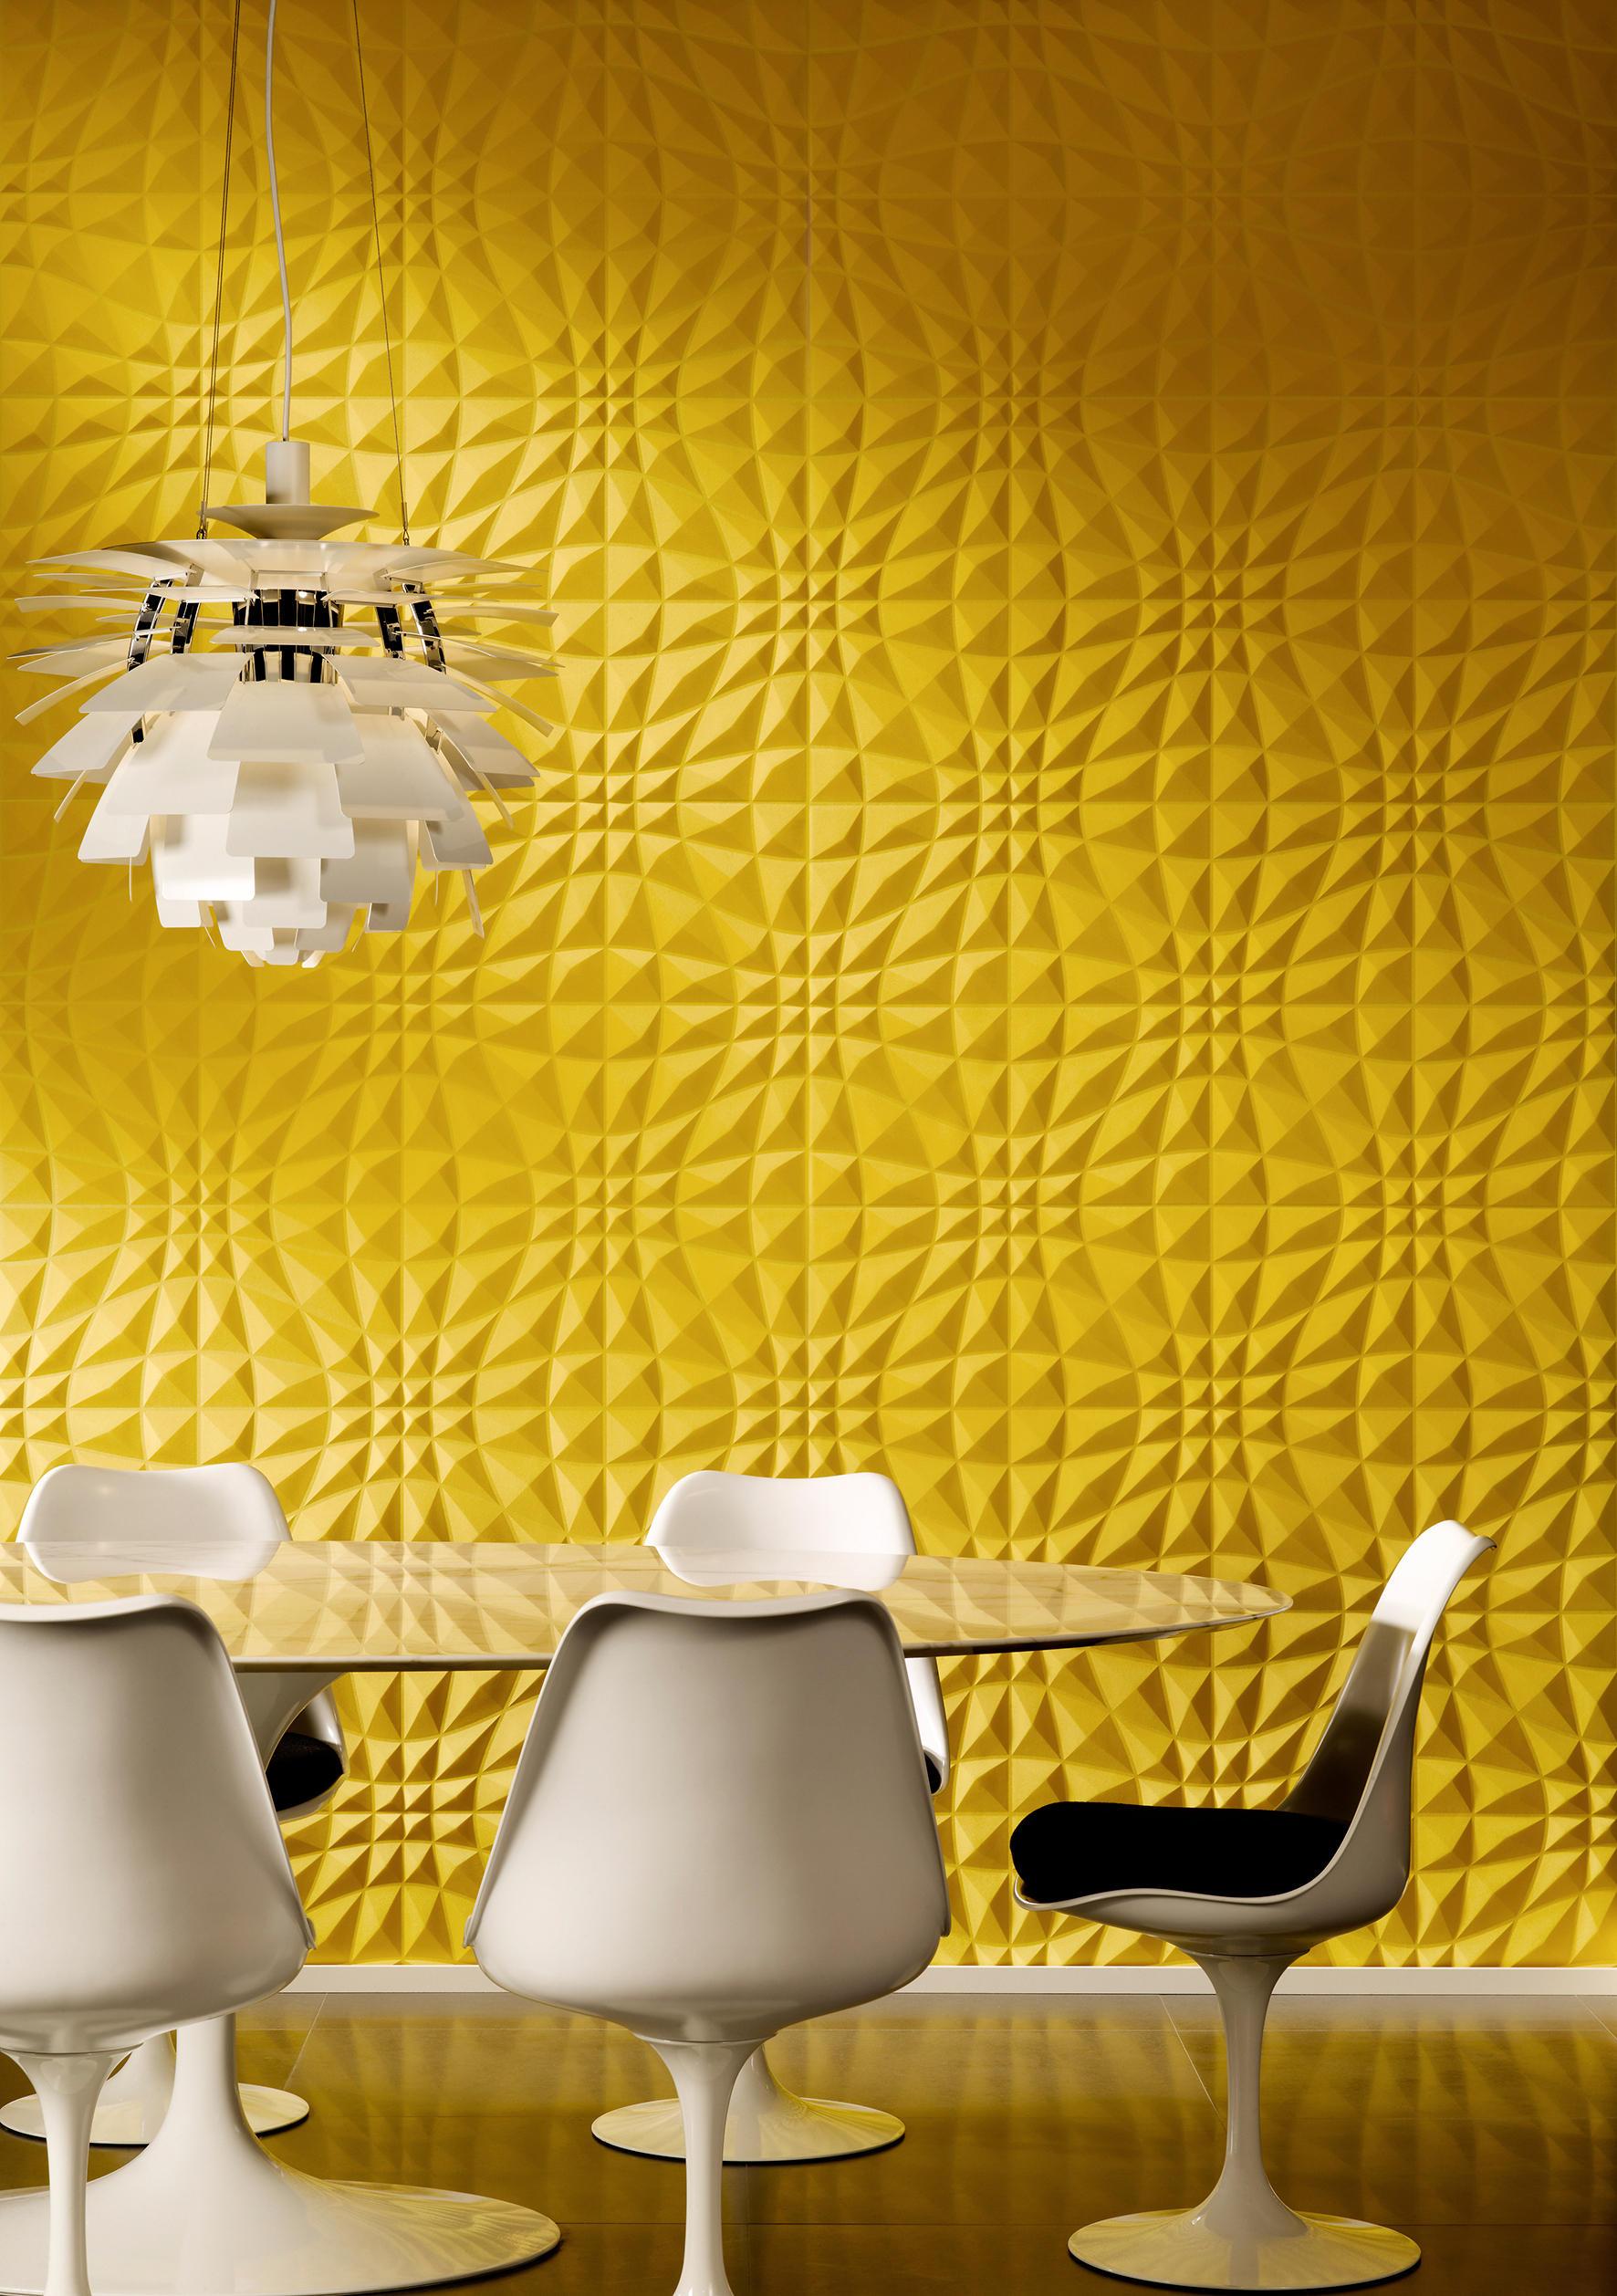 ... LG G Flex Wallpaper ...